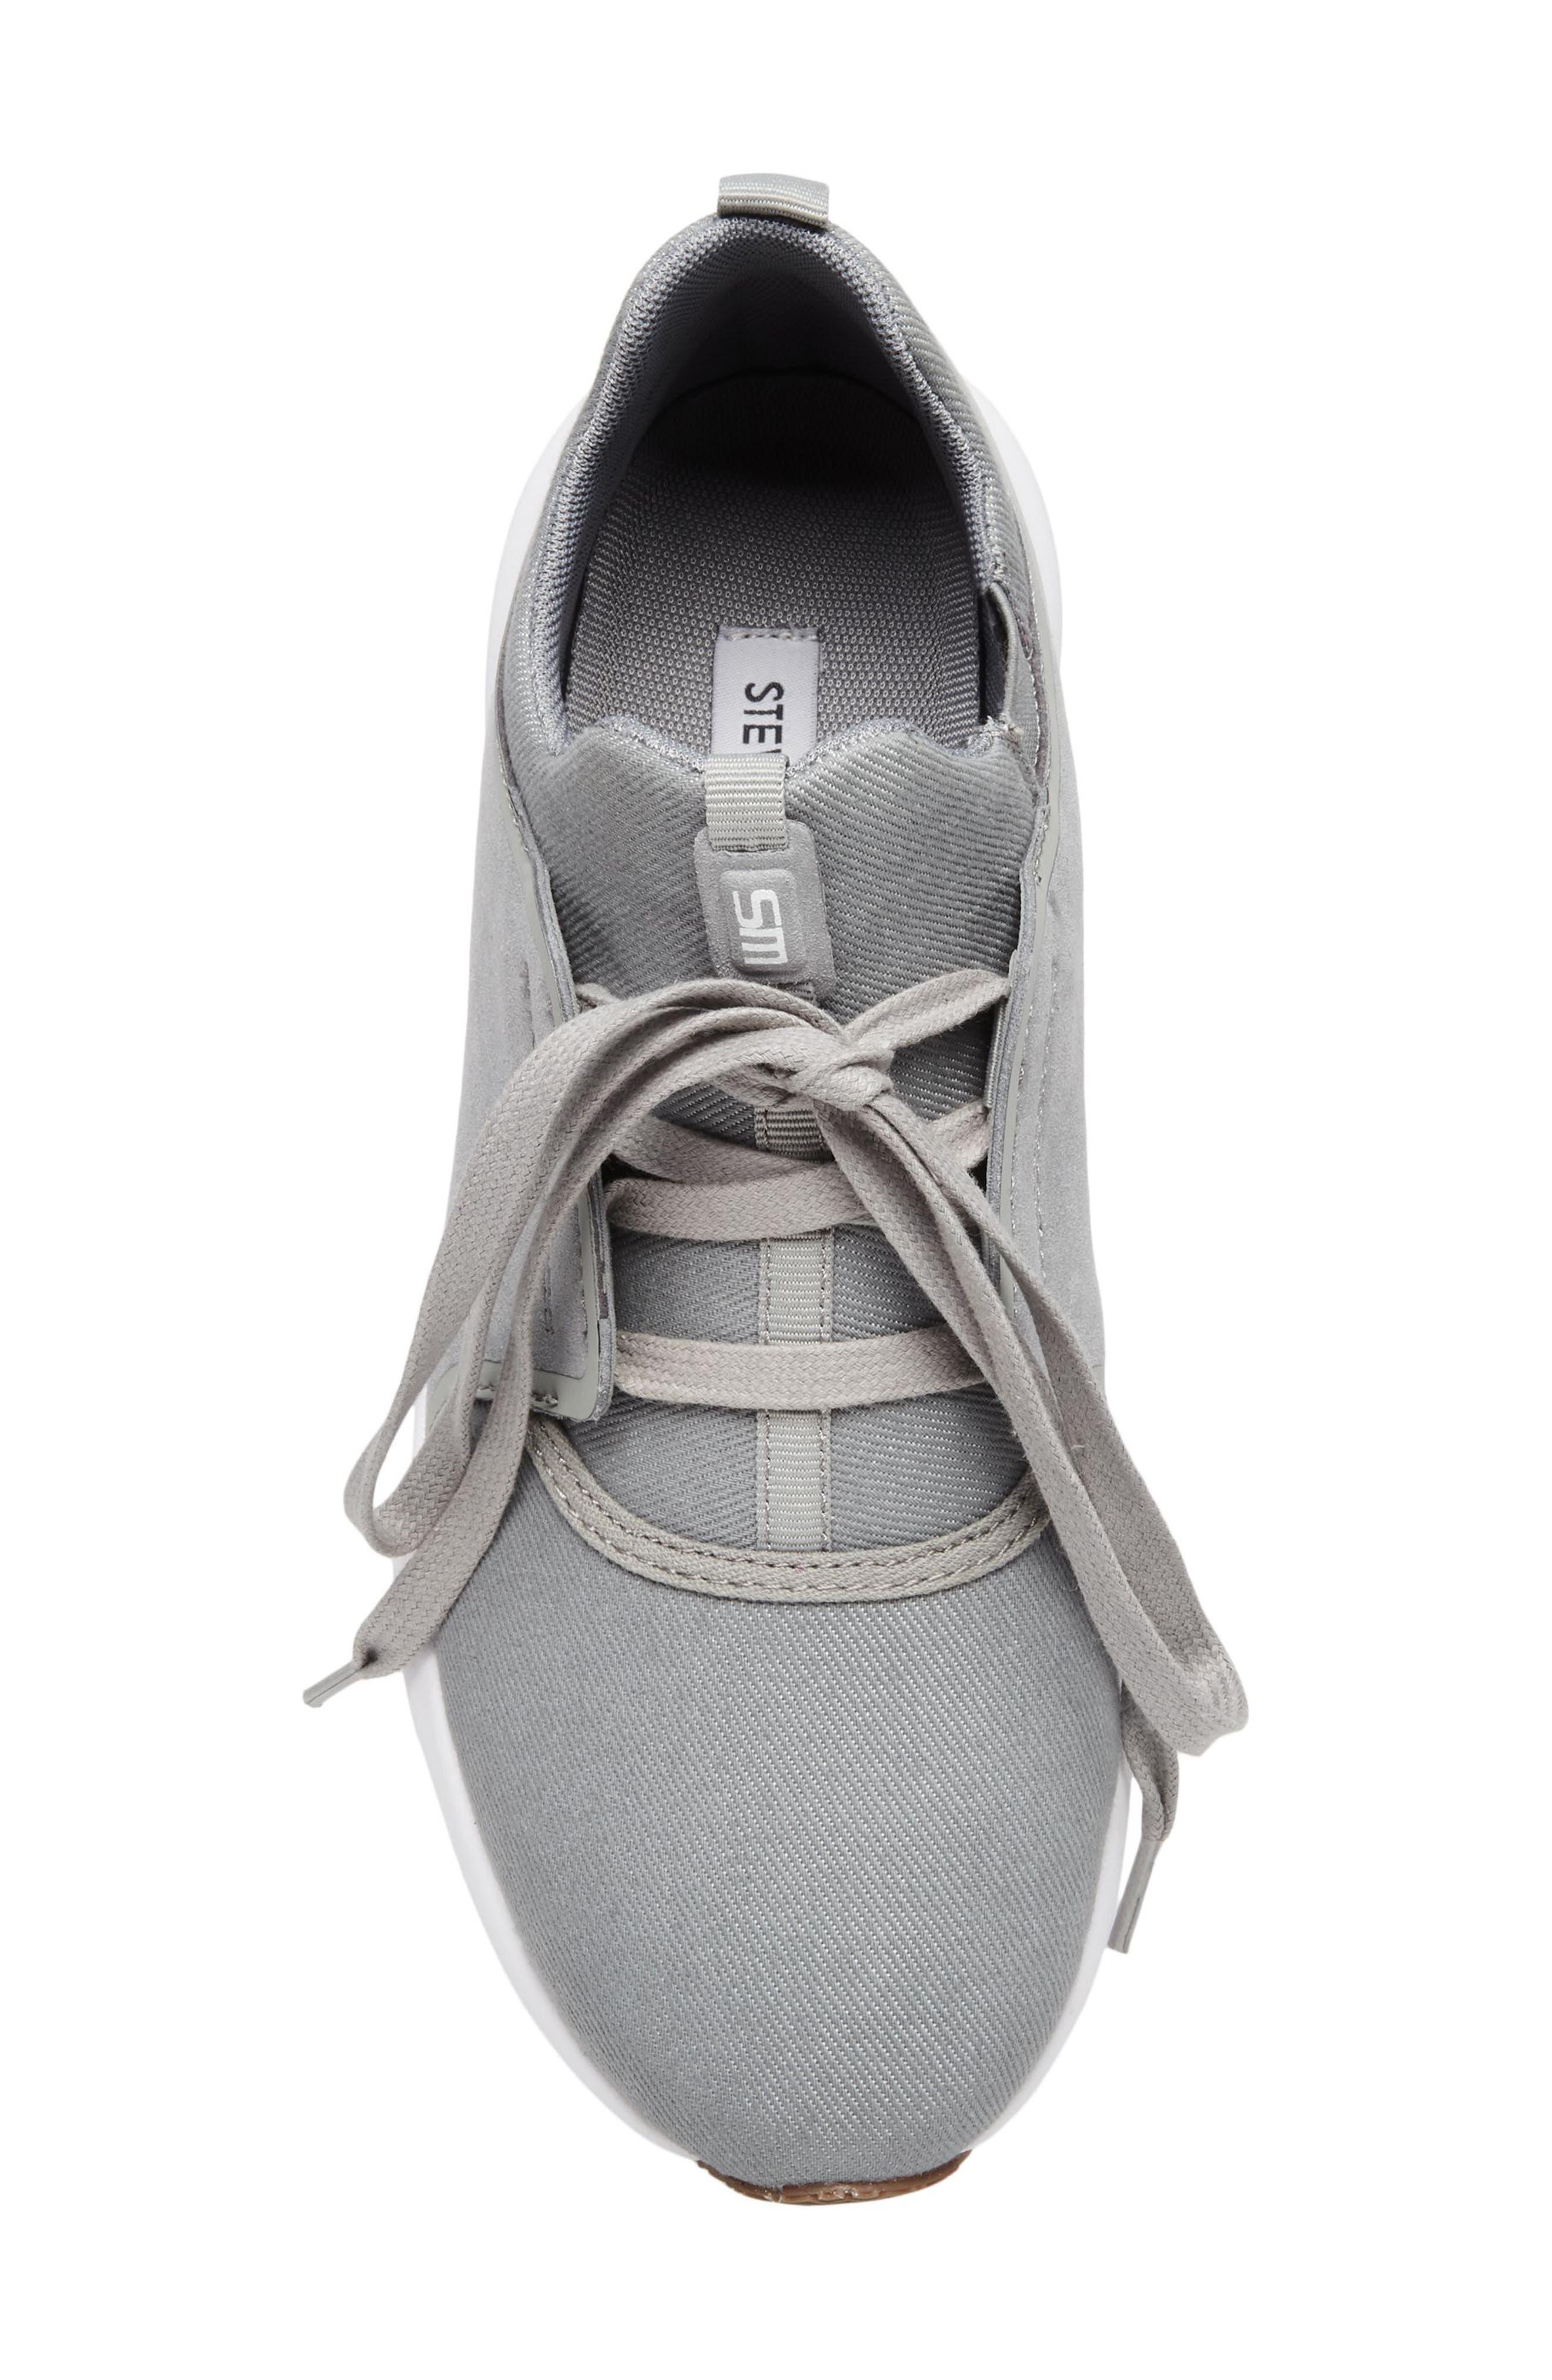 Barrett Sneaker,                             Alternate thumbnail 5, color,                             Grey Leather